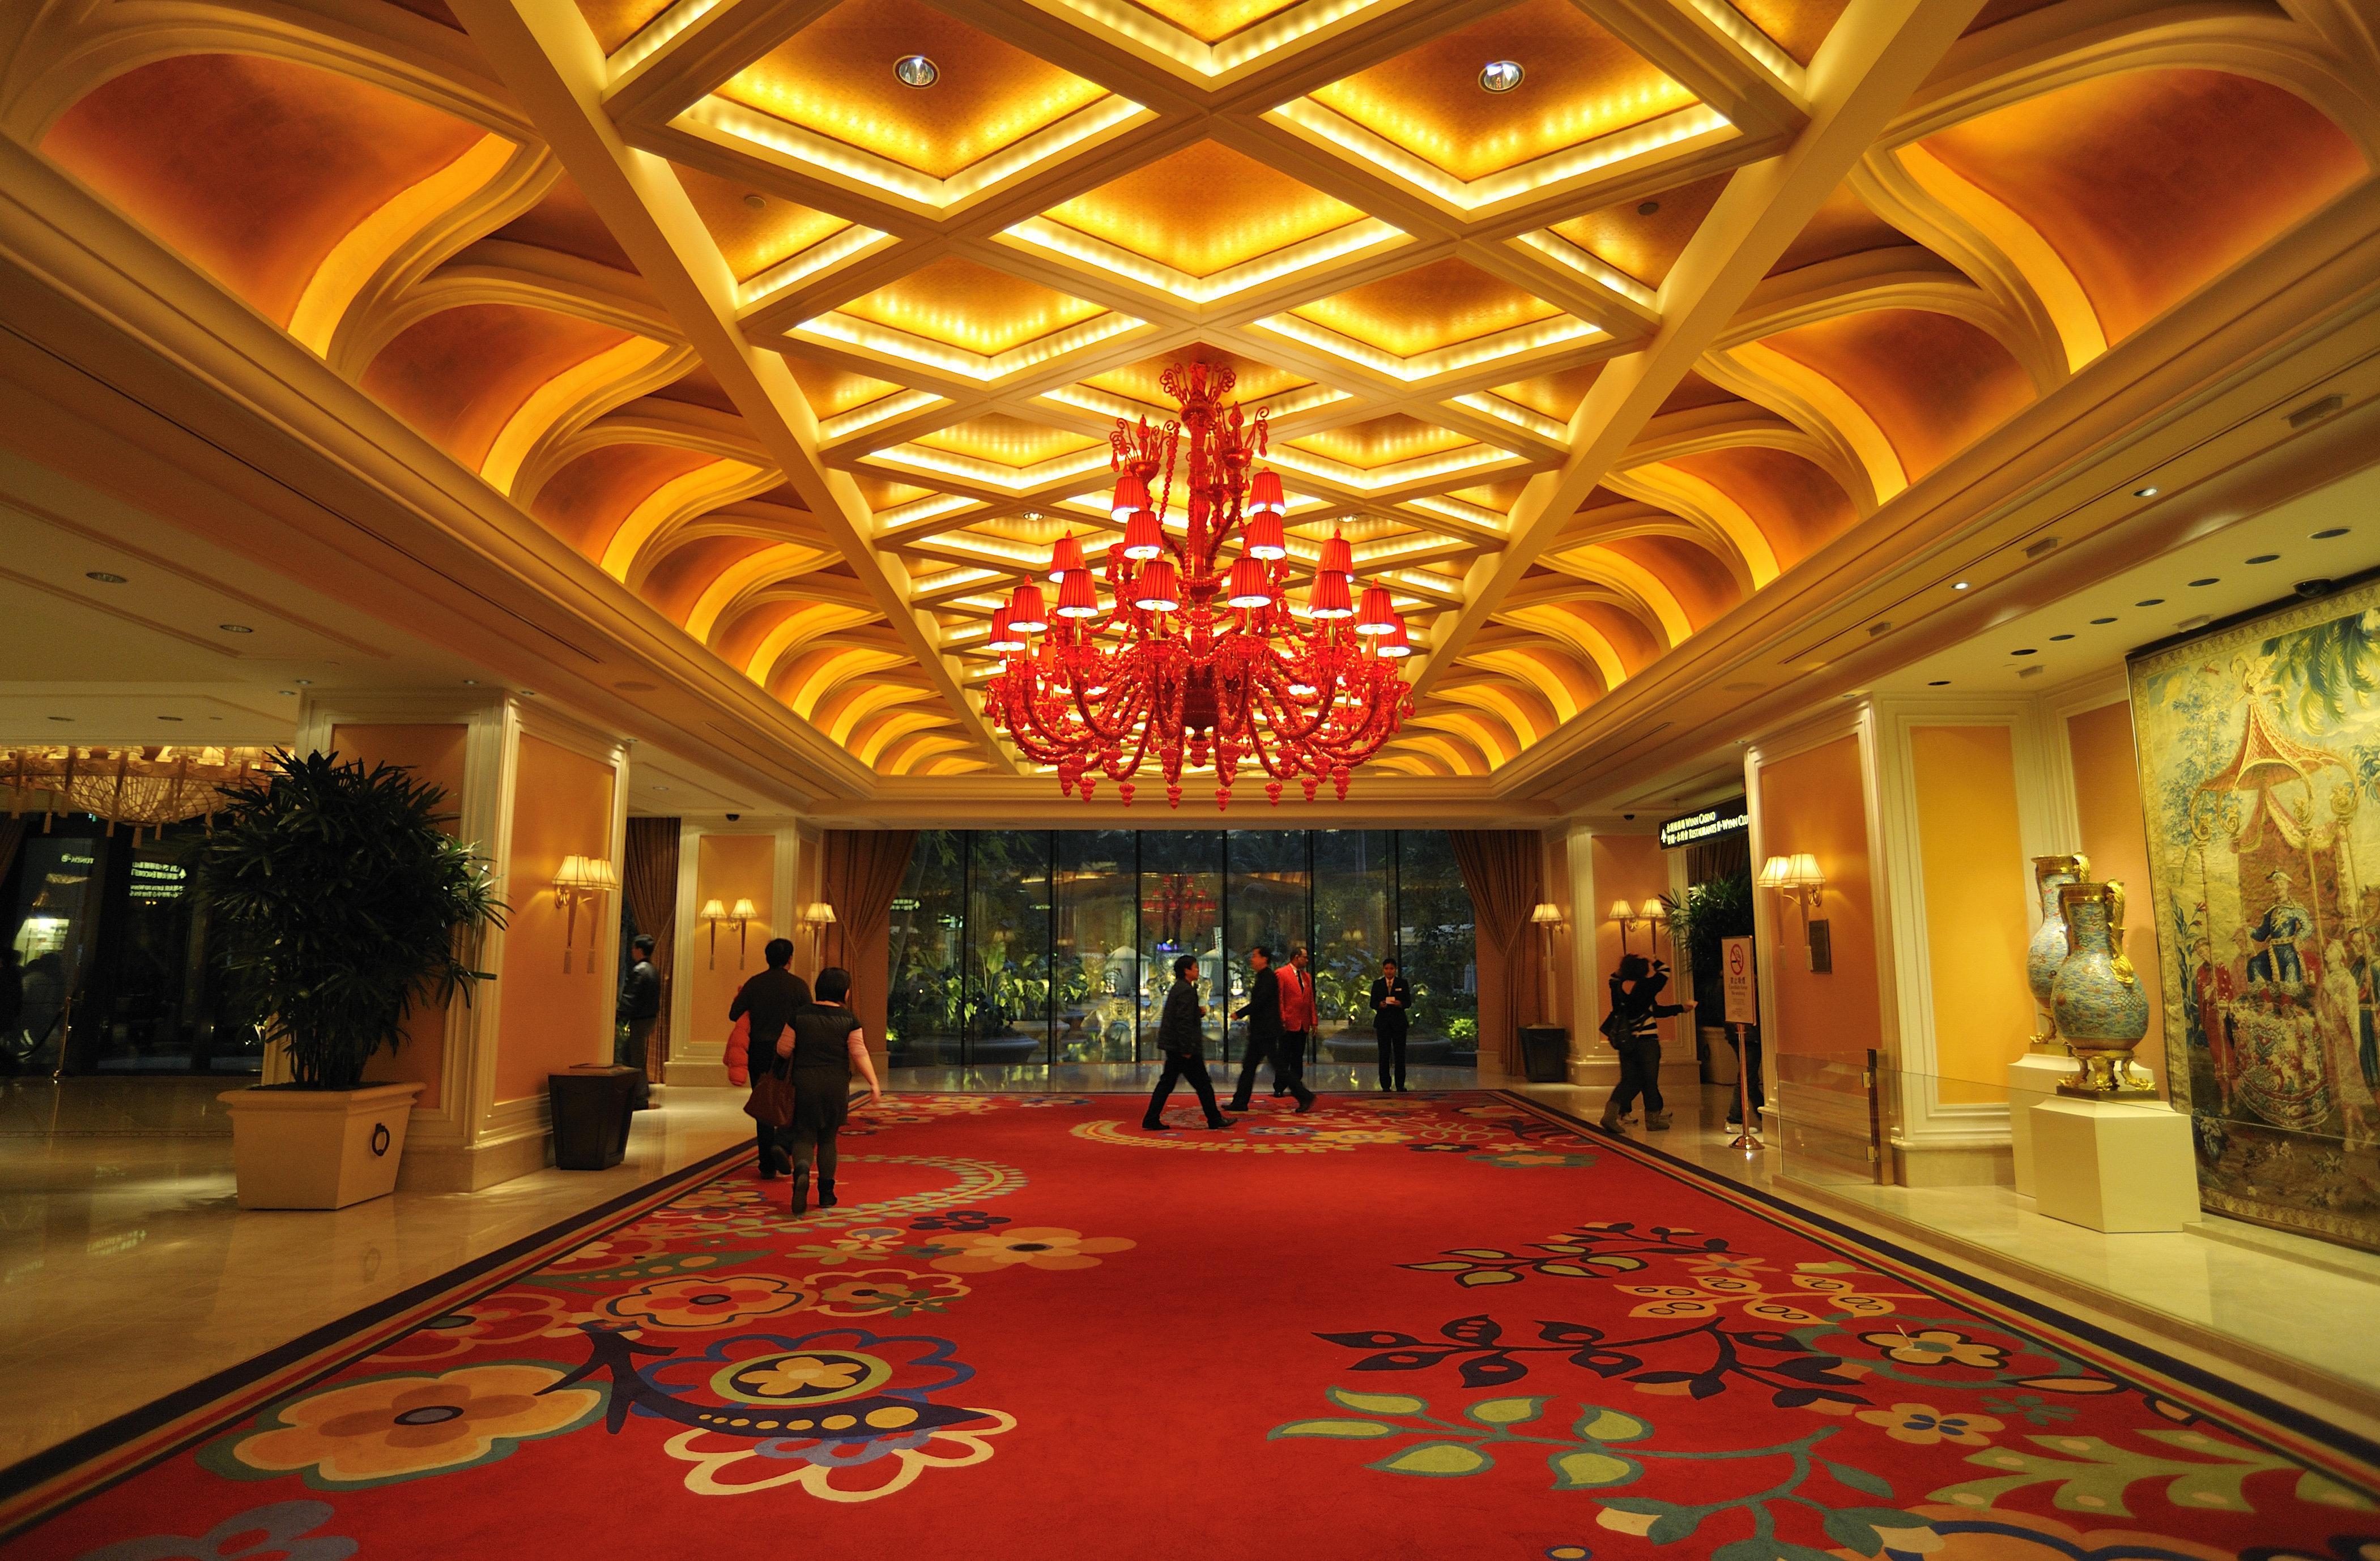 "Bernard books a penthouse suite at the sumptuous <a href=""https://www.wynnmacau.com/en"" target=""_blank"">Wynn Macau</a> for Co"